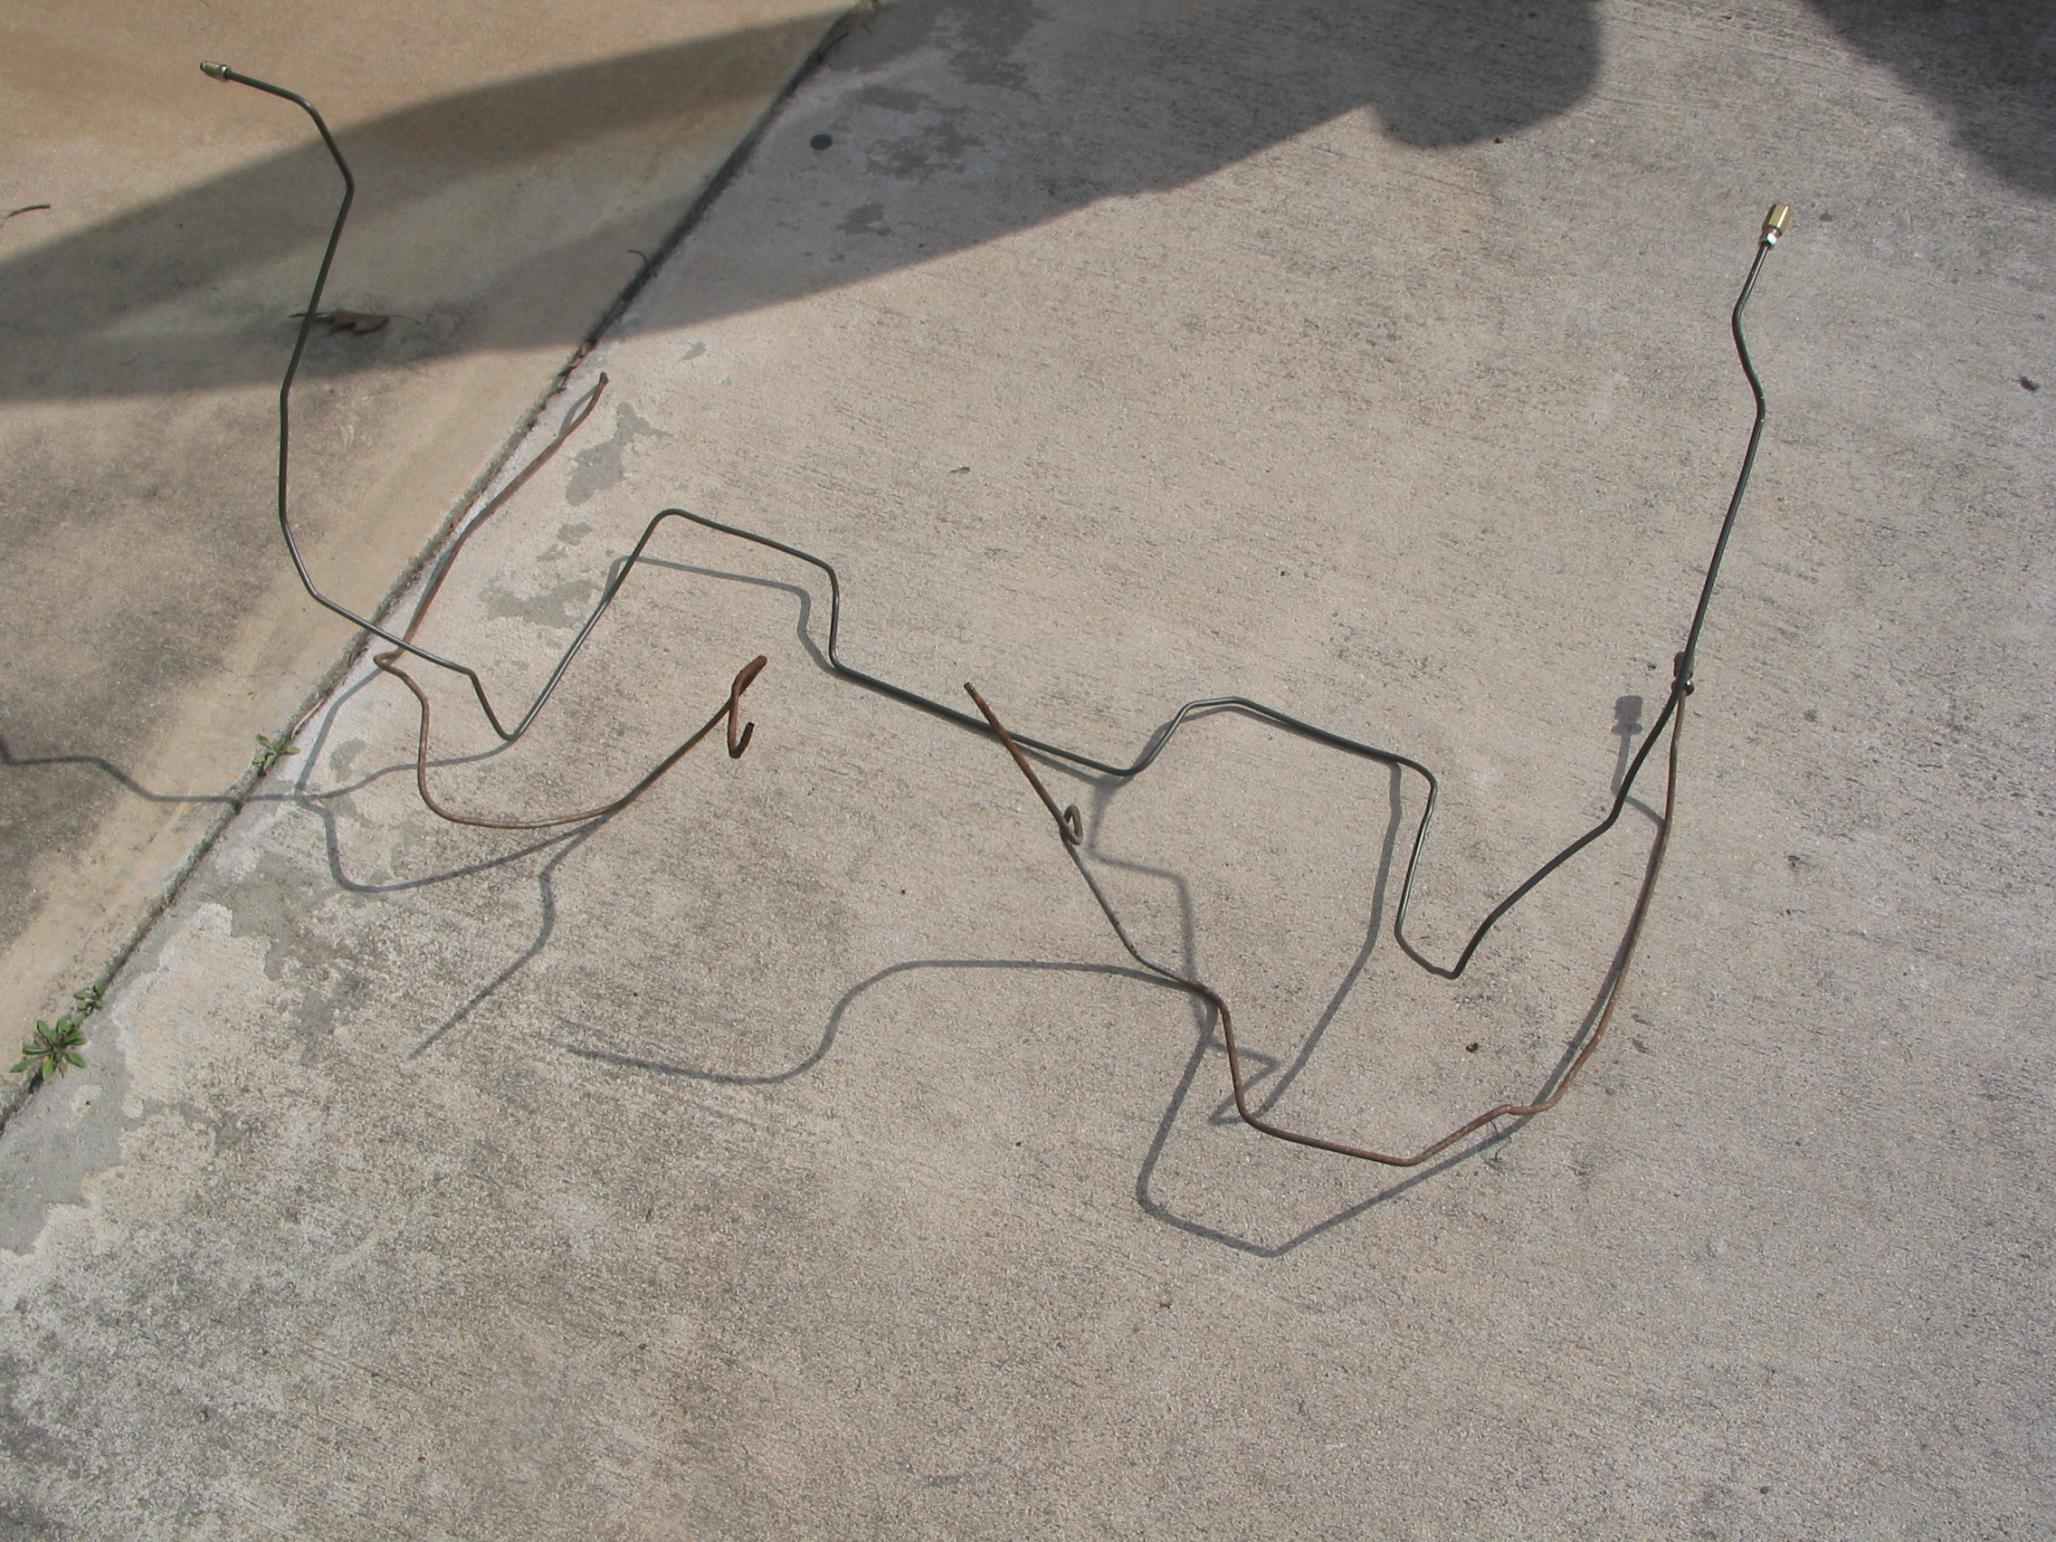 Trailblazer Brake Diagram 97 K1500 Diy Brake Lines Chevrolet Forum Chevy